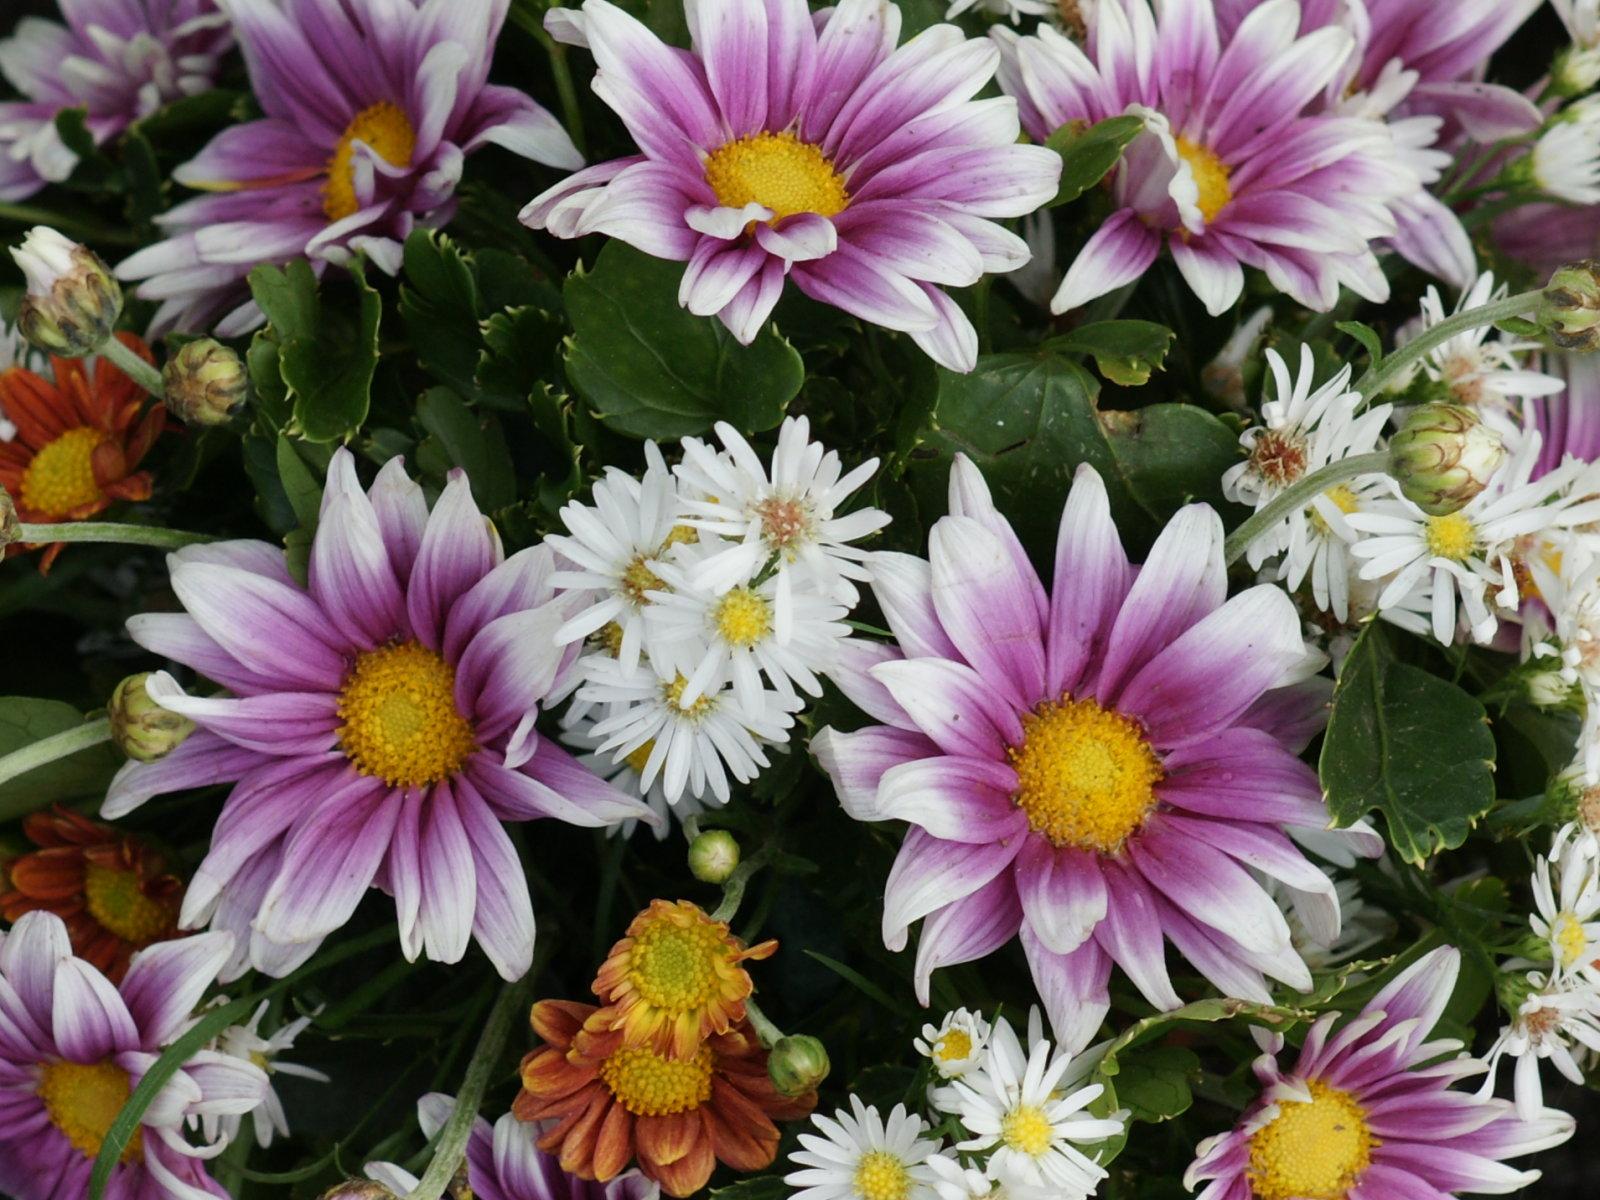 flowers for flower lovers.: Daisy flowers desktop wallpapers.